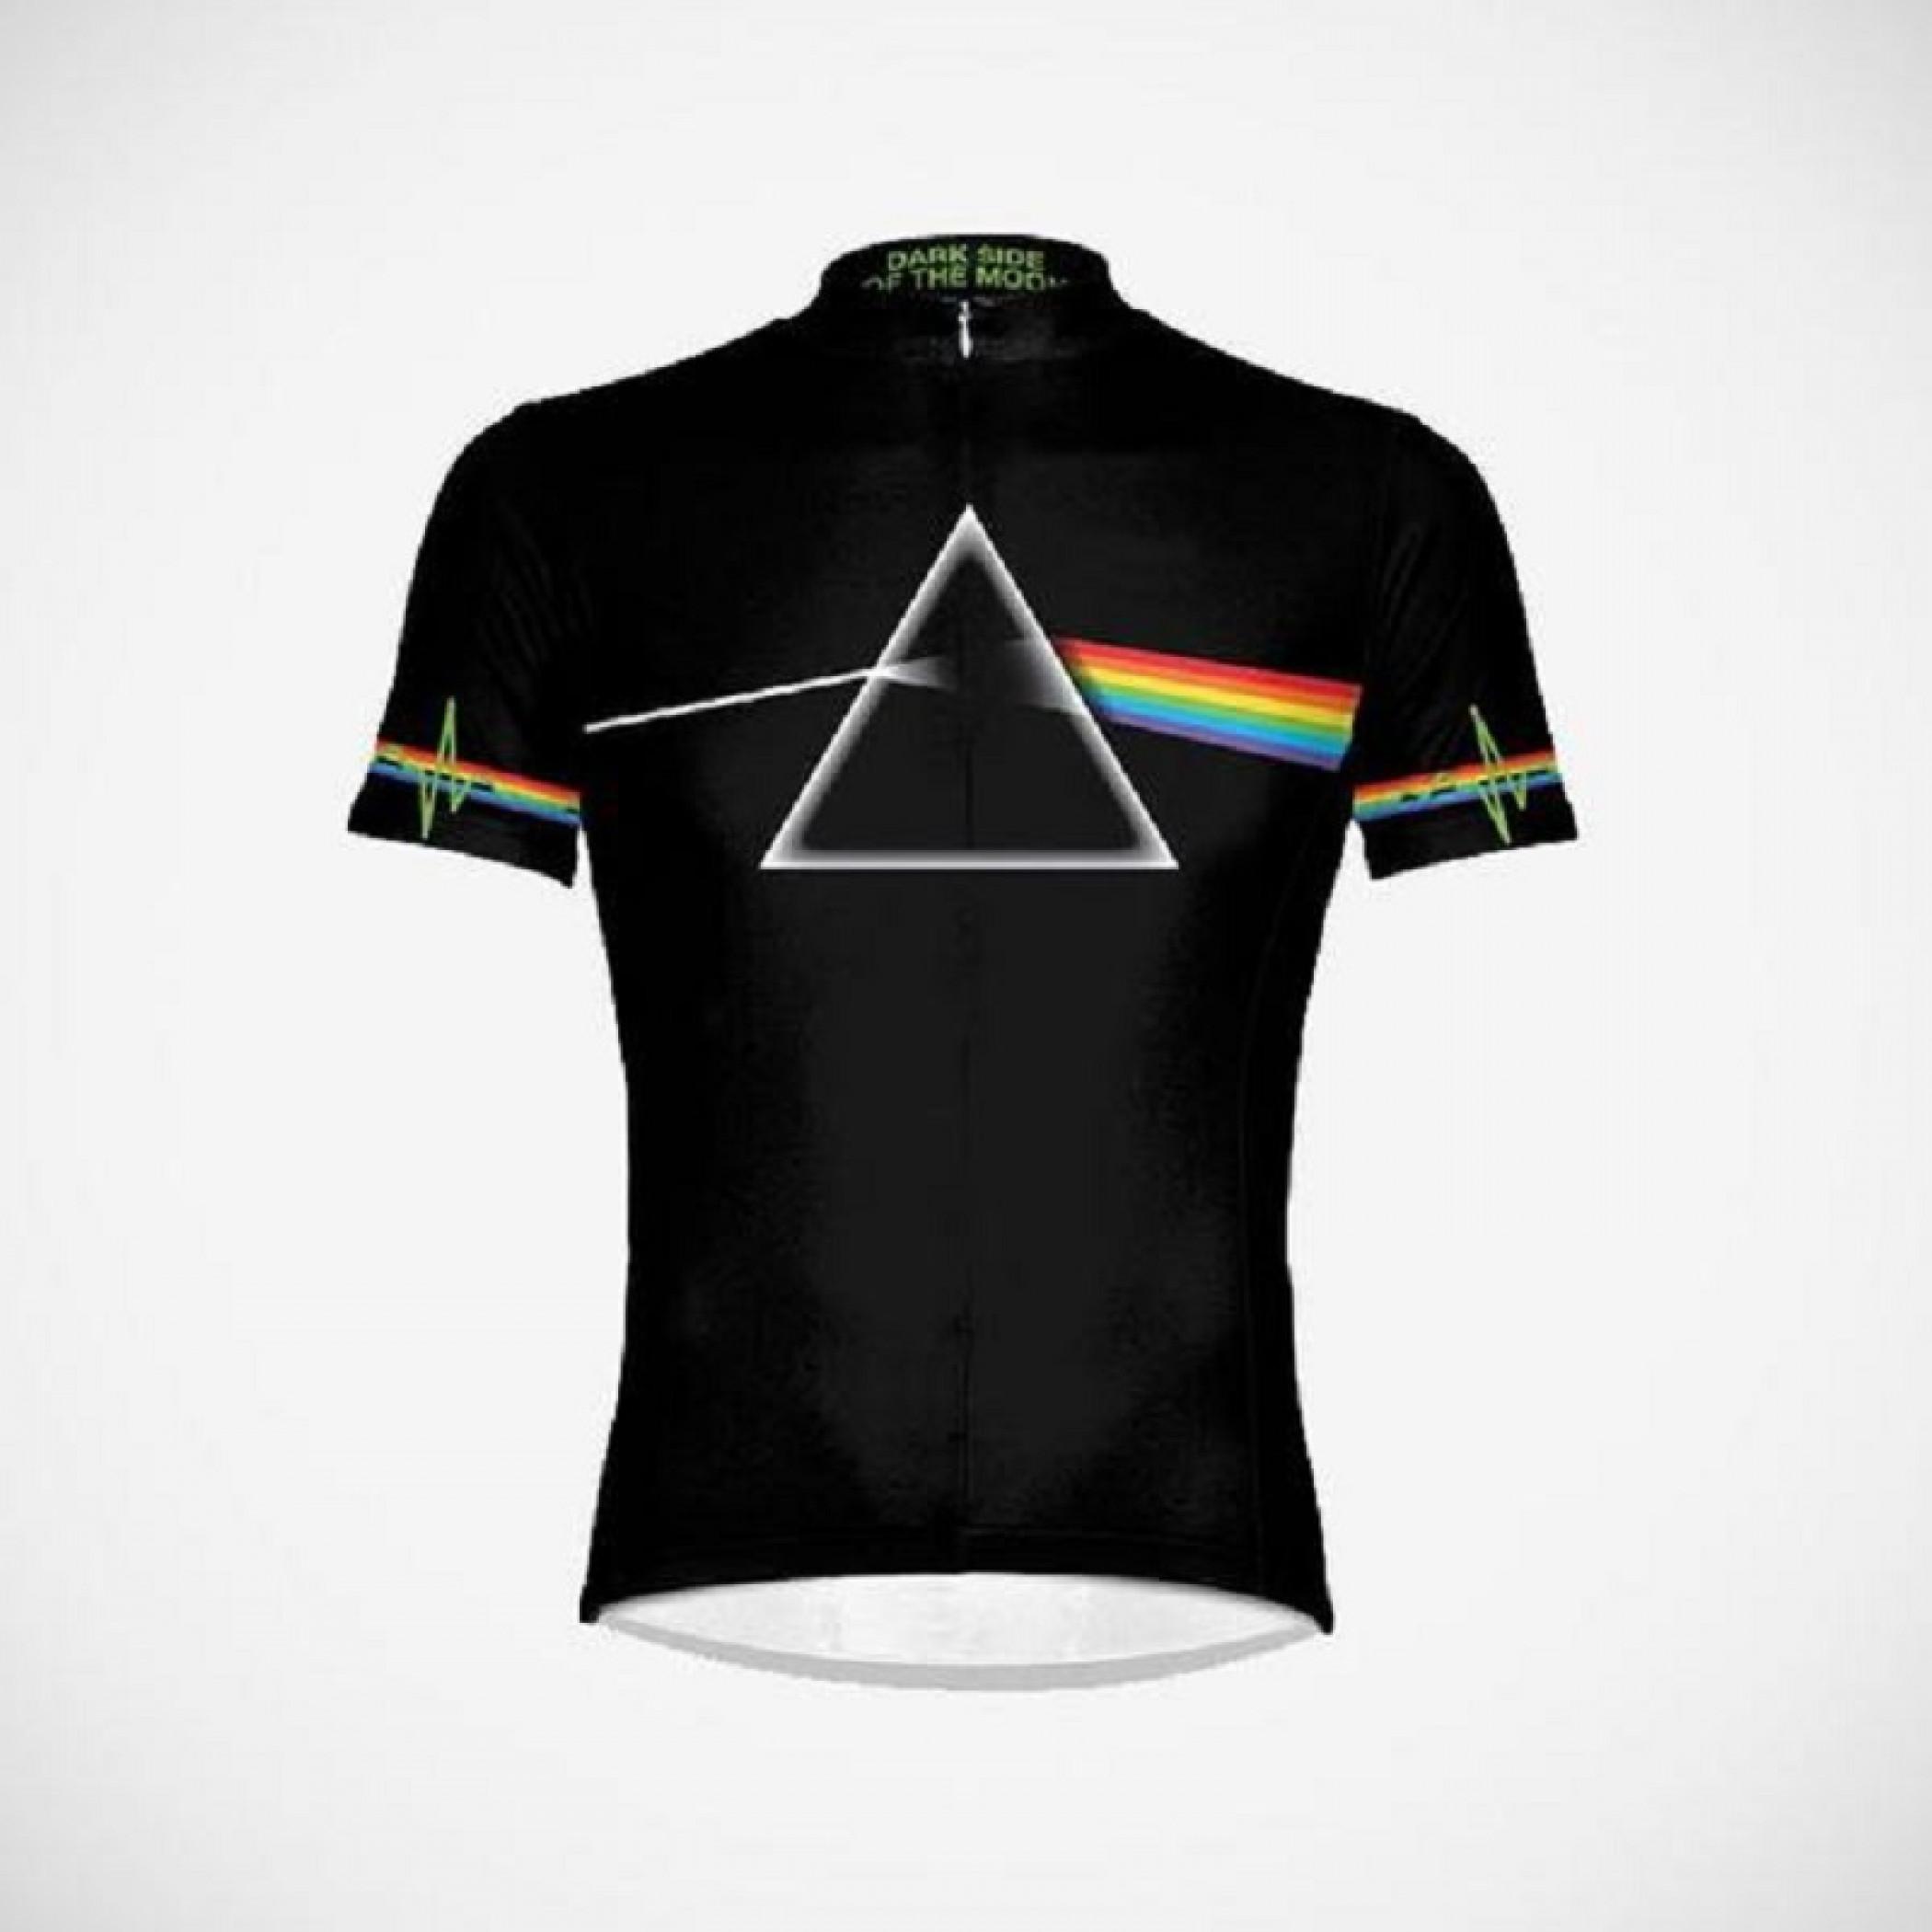 Pink Floyd Men's Cycling Jersey